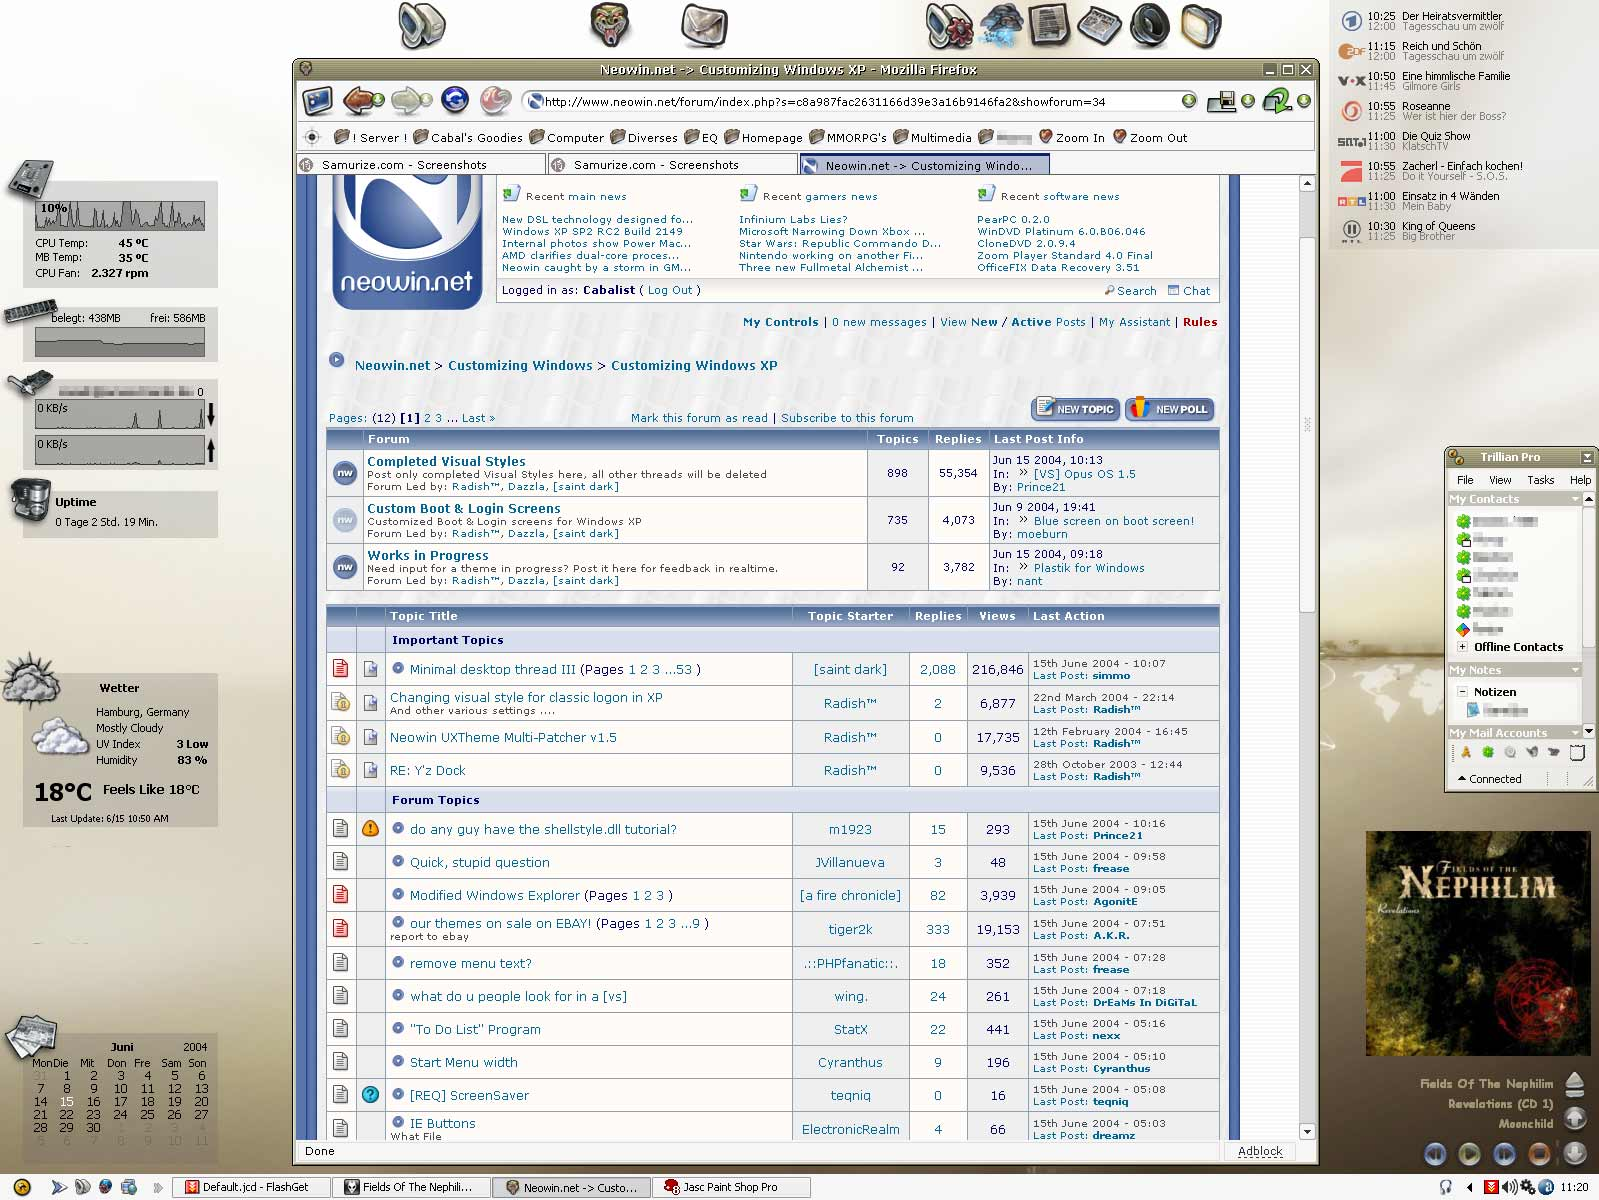 Title: My June Desktop: Gant